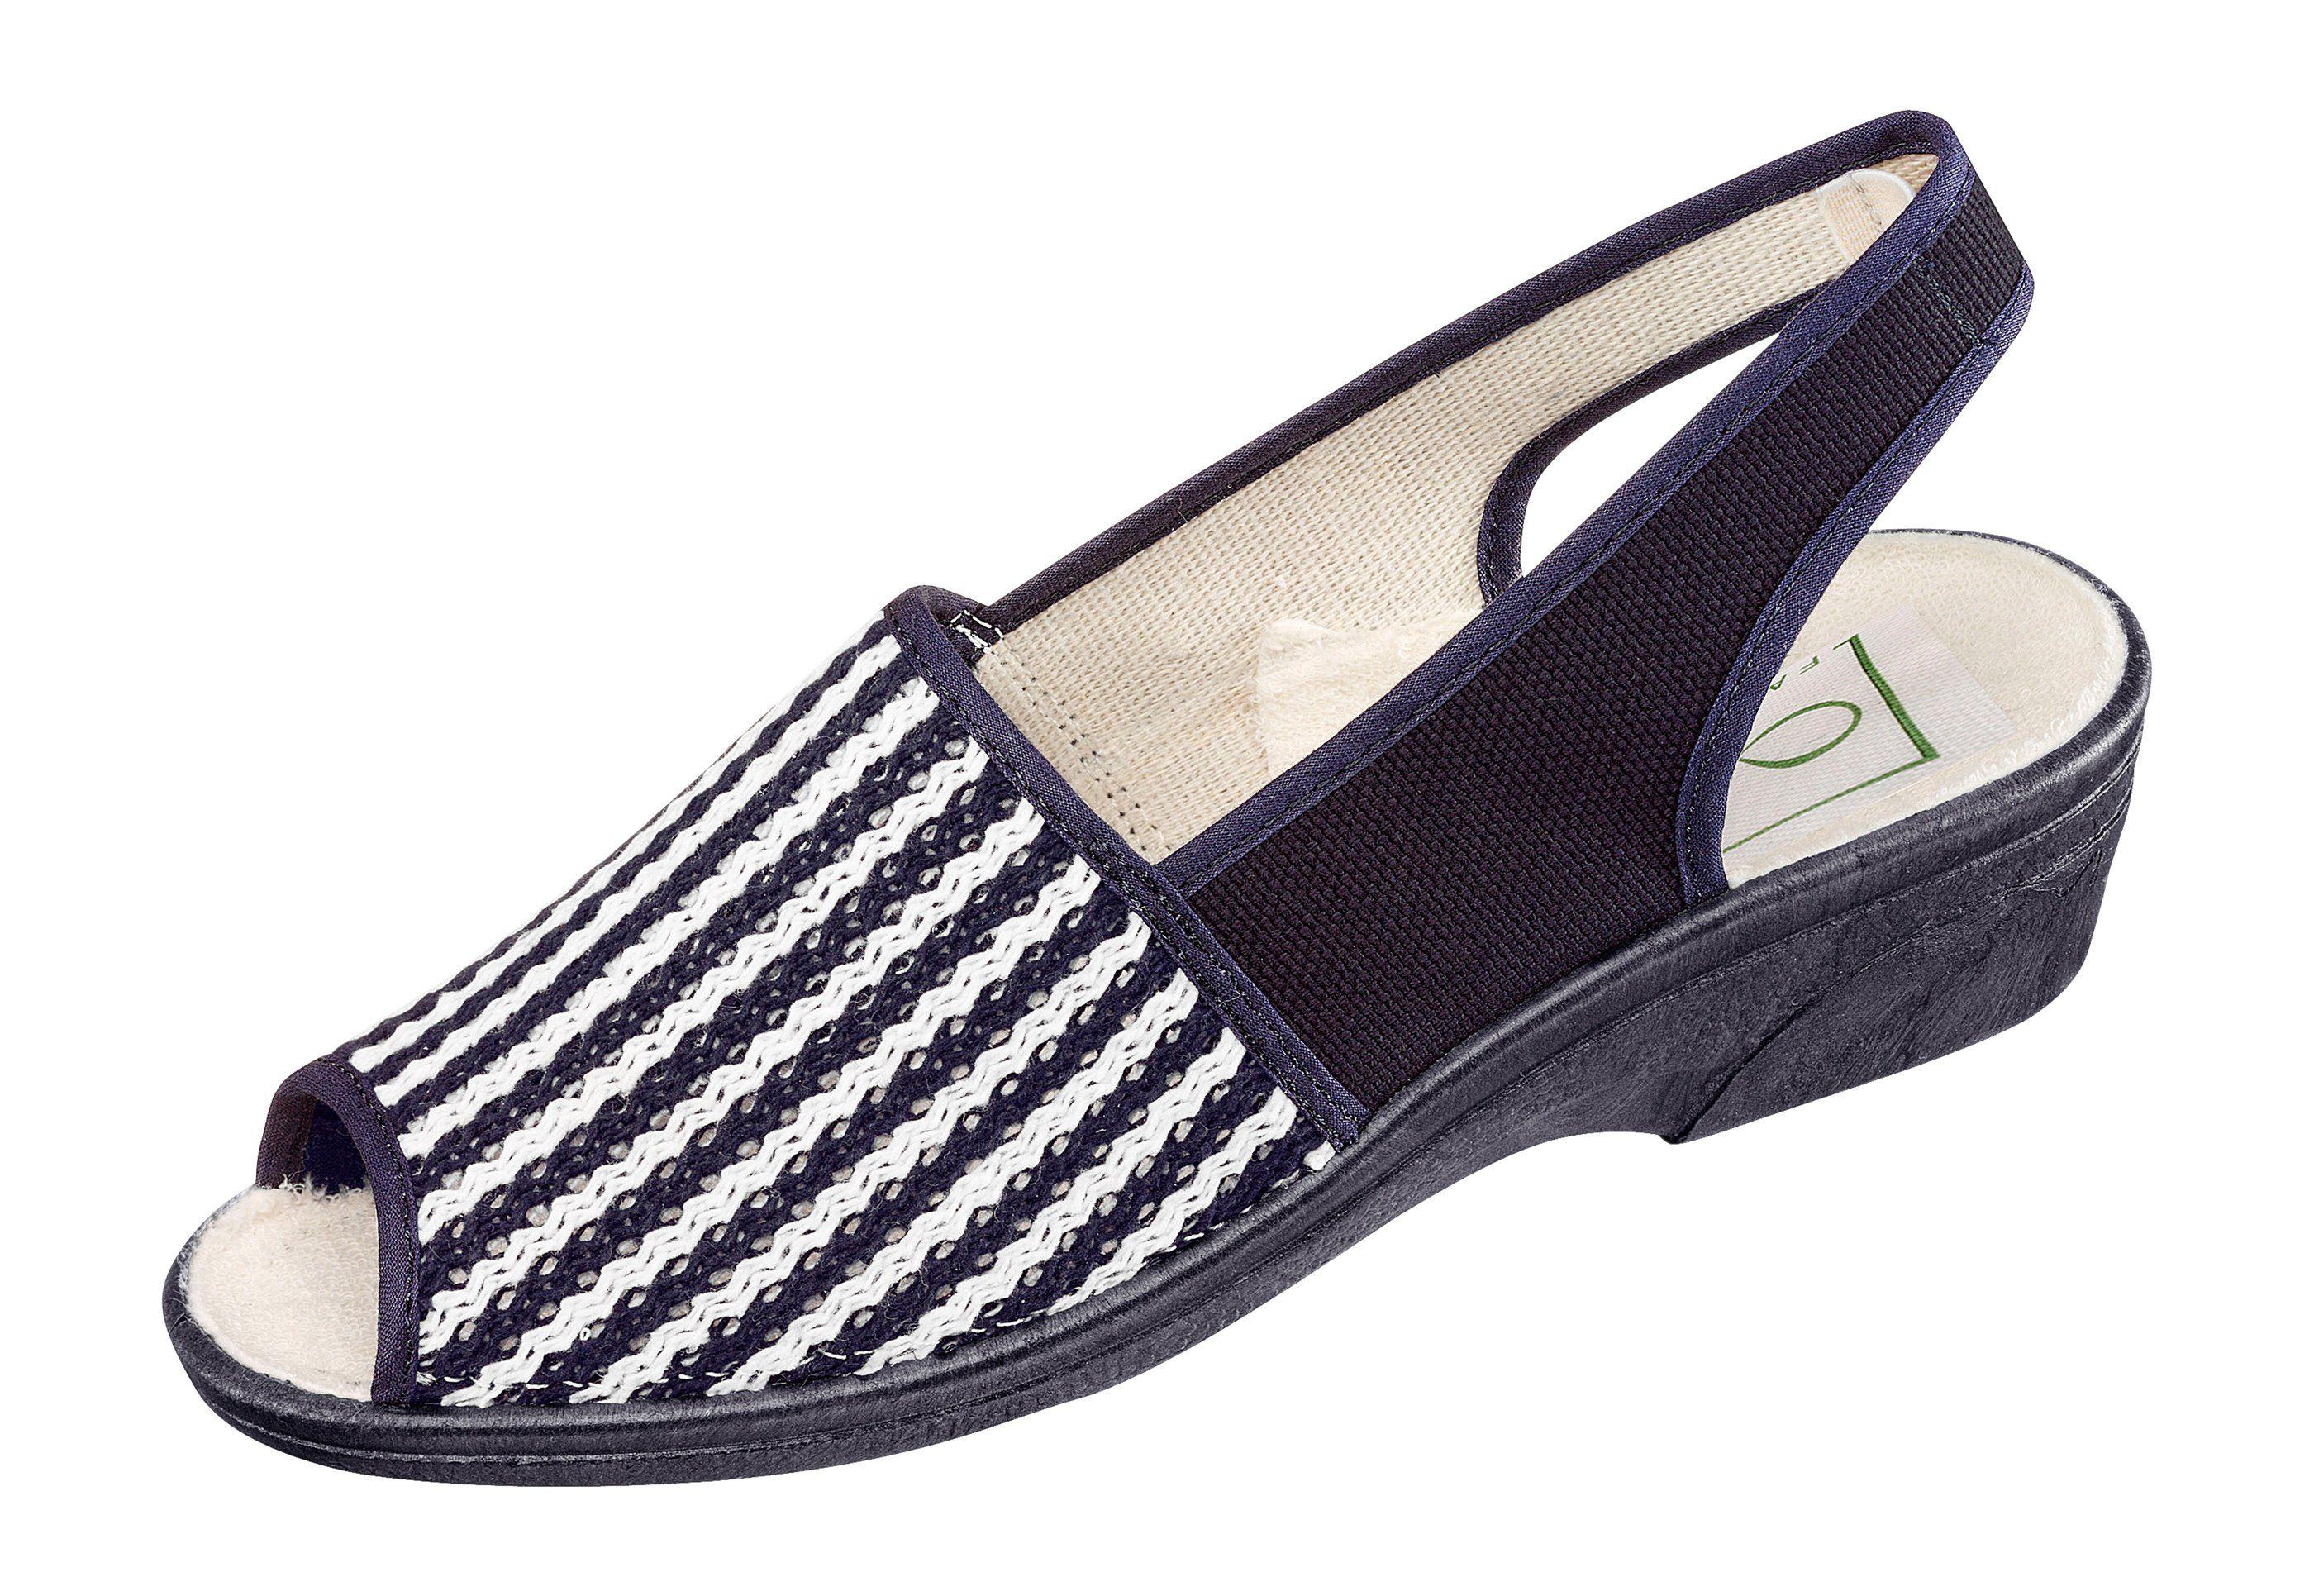 Classic Sandalette mit flexibler Synthetik-Laufsohle online kaufen  marine